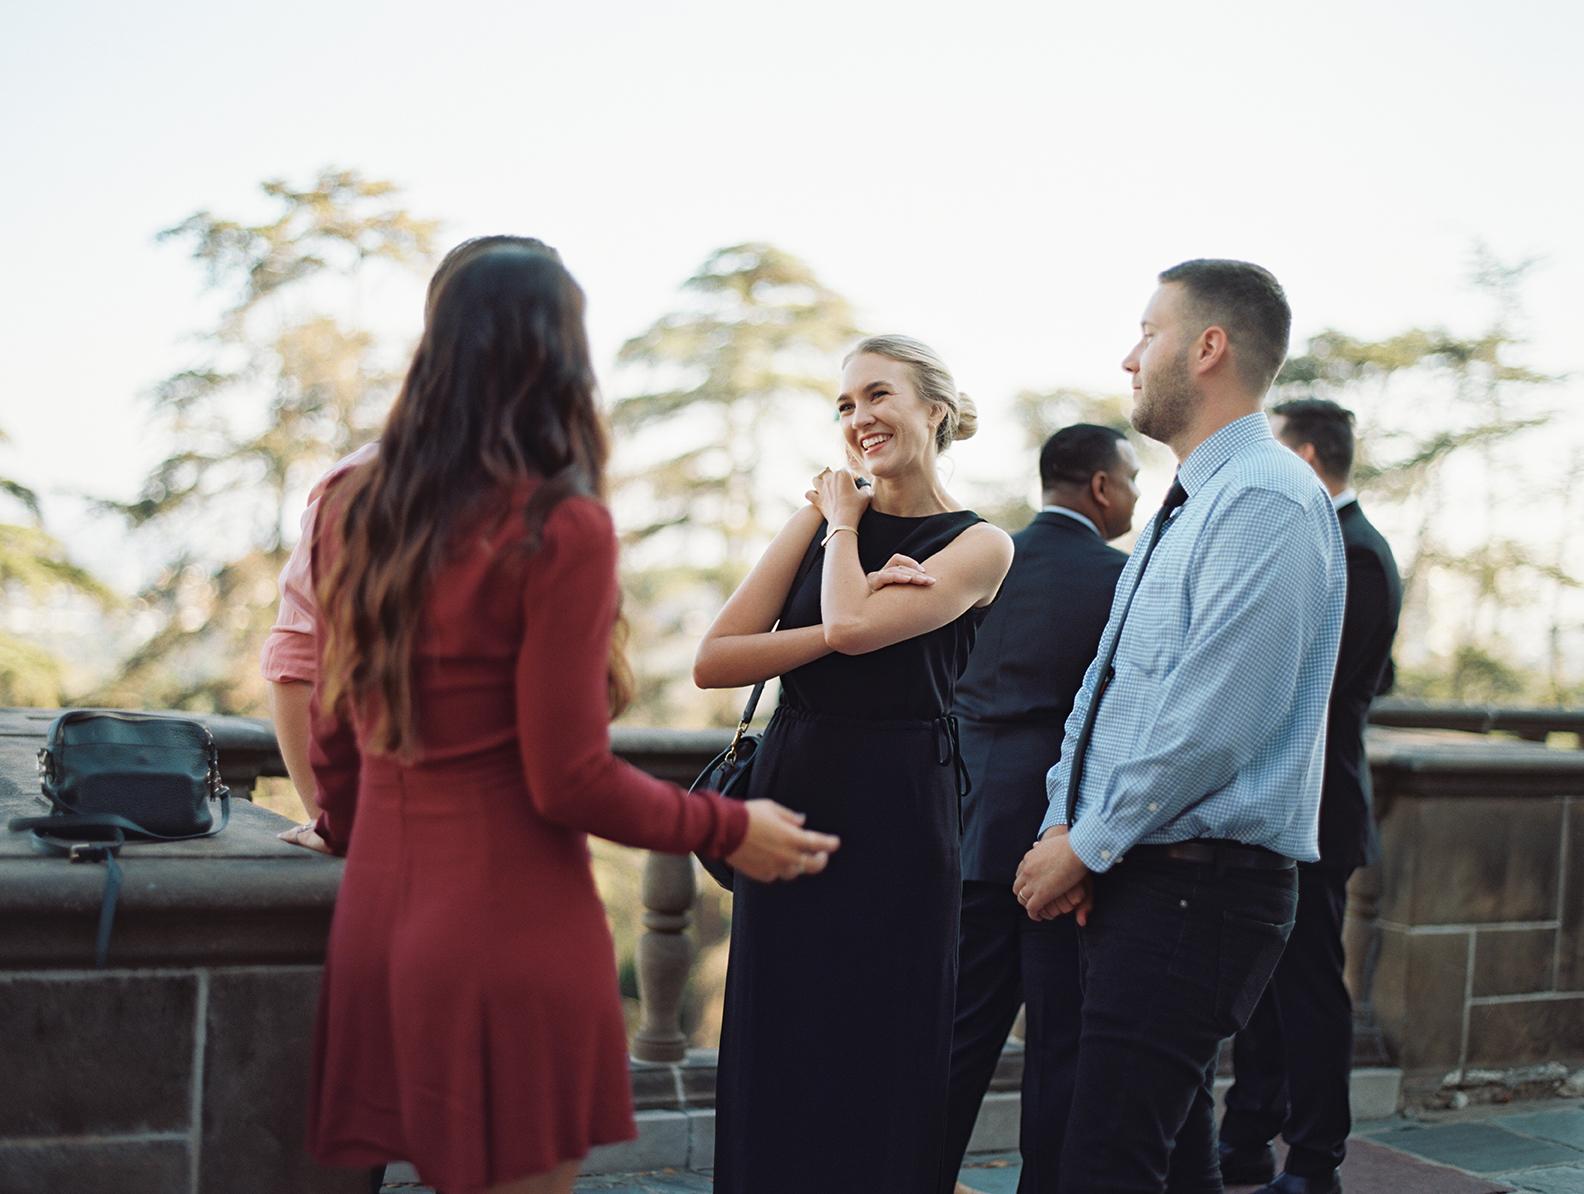 157-brian-sarra-los-angeles-wedding-brumley-wells-photography.jpg